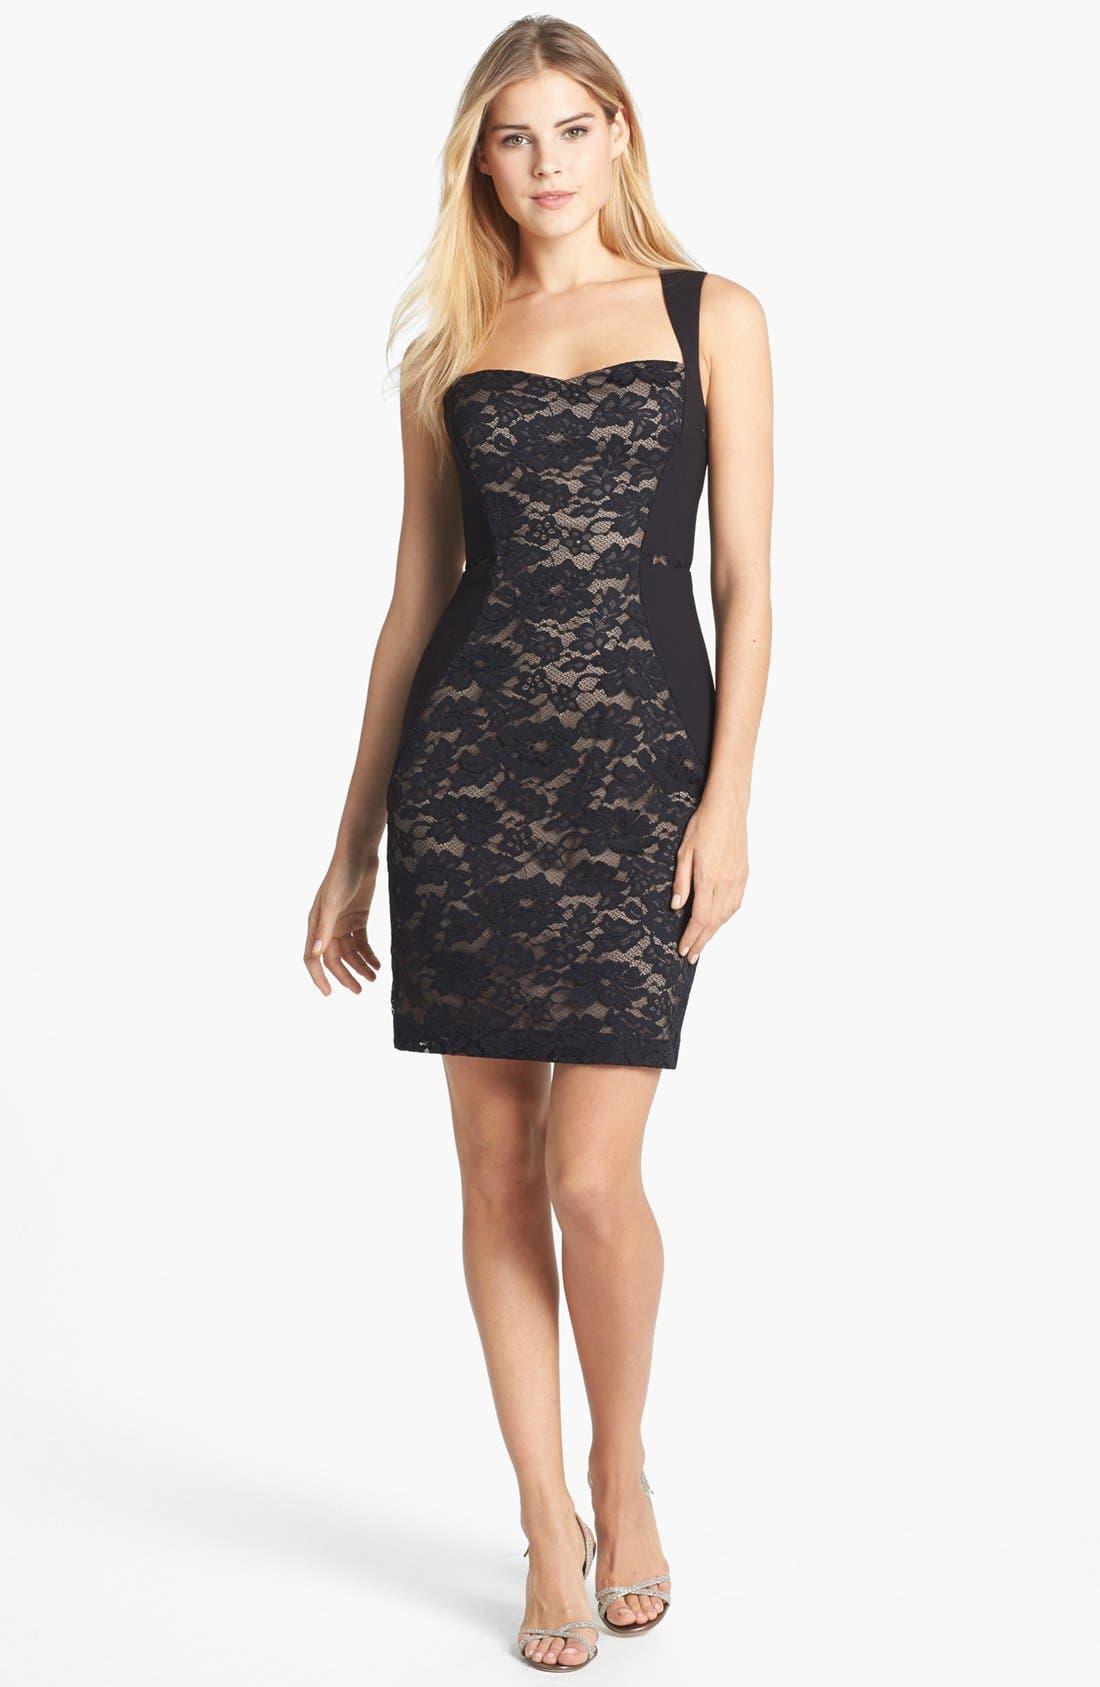 Alternate Image 1 Selected - Aidan Mattox Lace Paneled Body-Con Dress